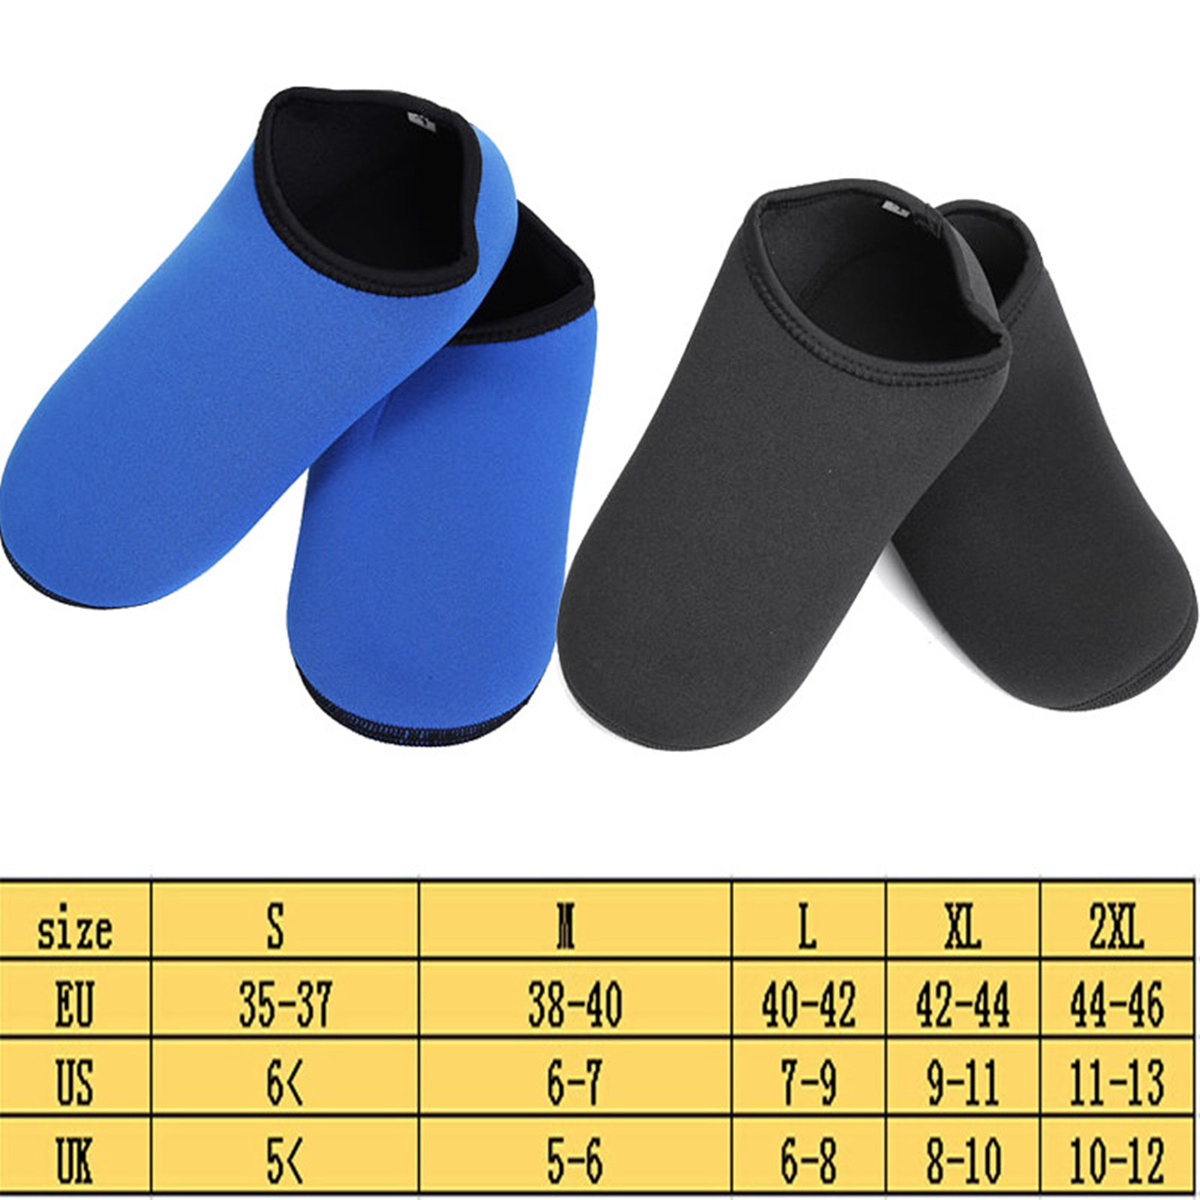 2.5mm Neoprene Water Shoes Aqua Socks Diving Wetsuit Non-slip Swimming Beach